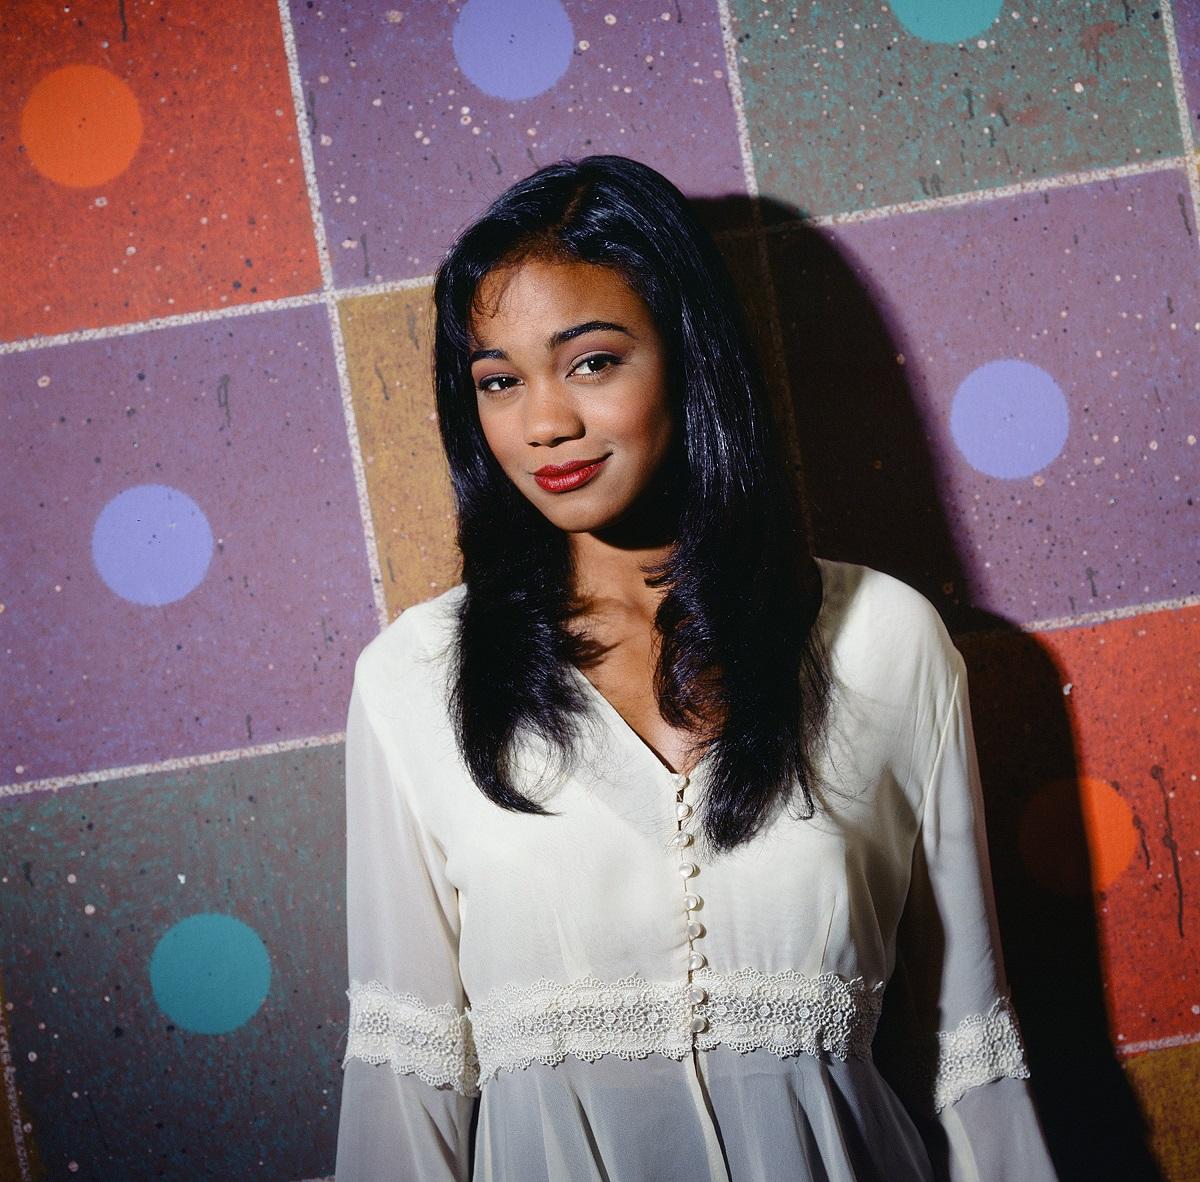 Tatyana Ali as Ashley Banks